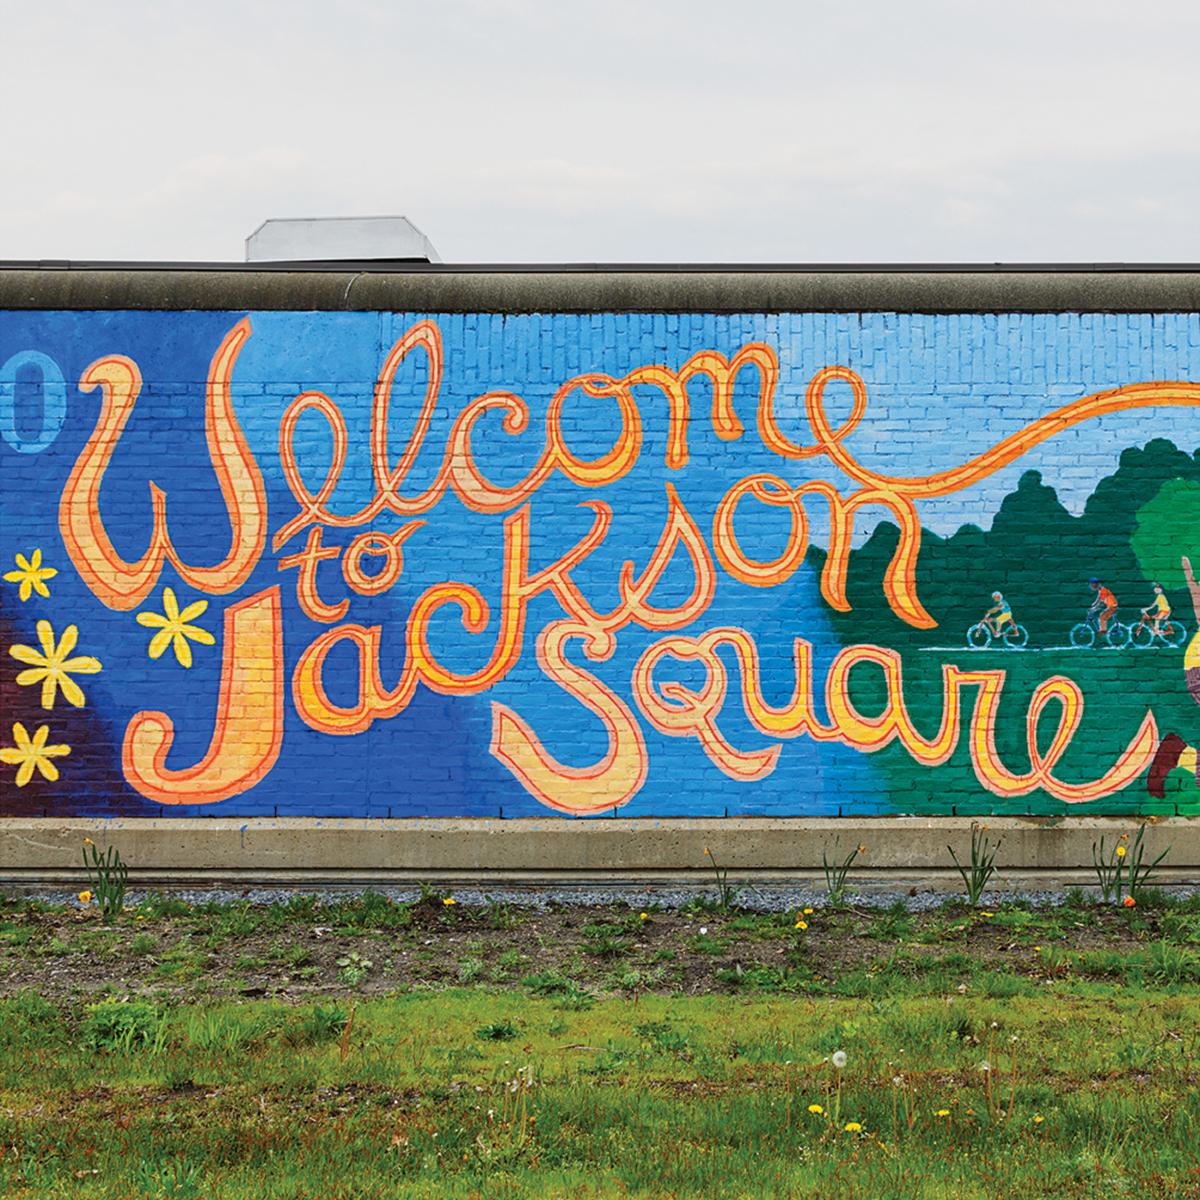 boston squares photo essay jackson square hyde square jamaica plain